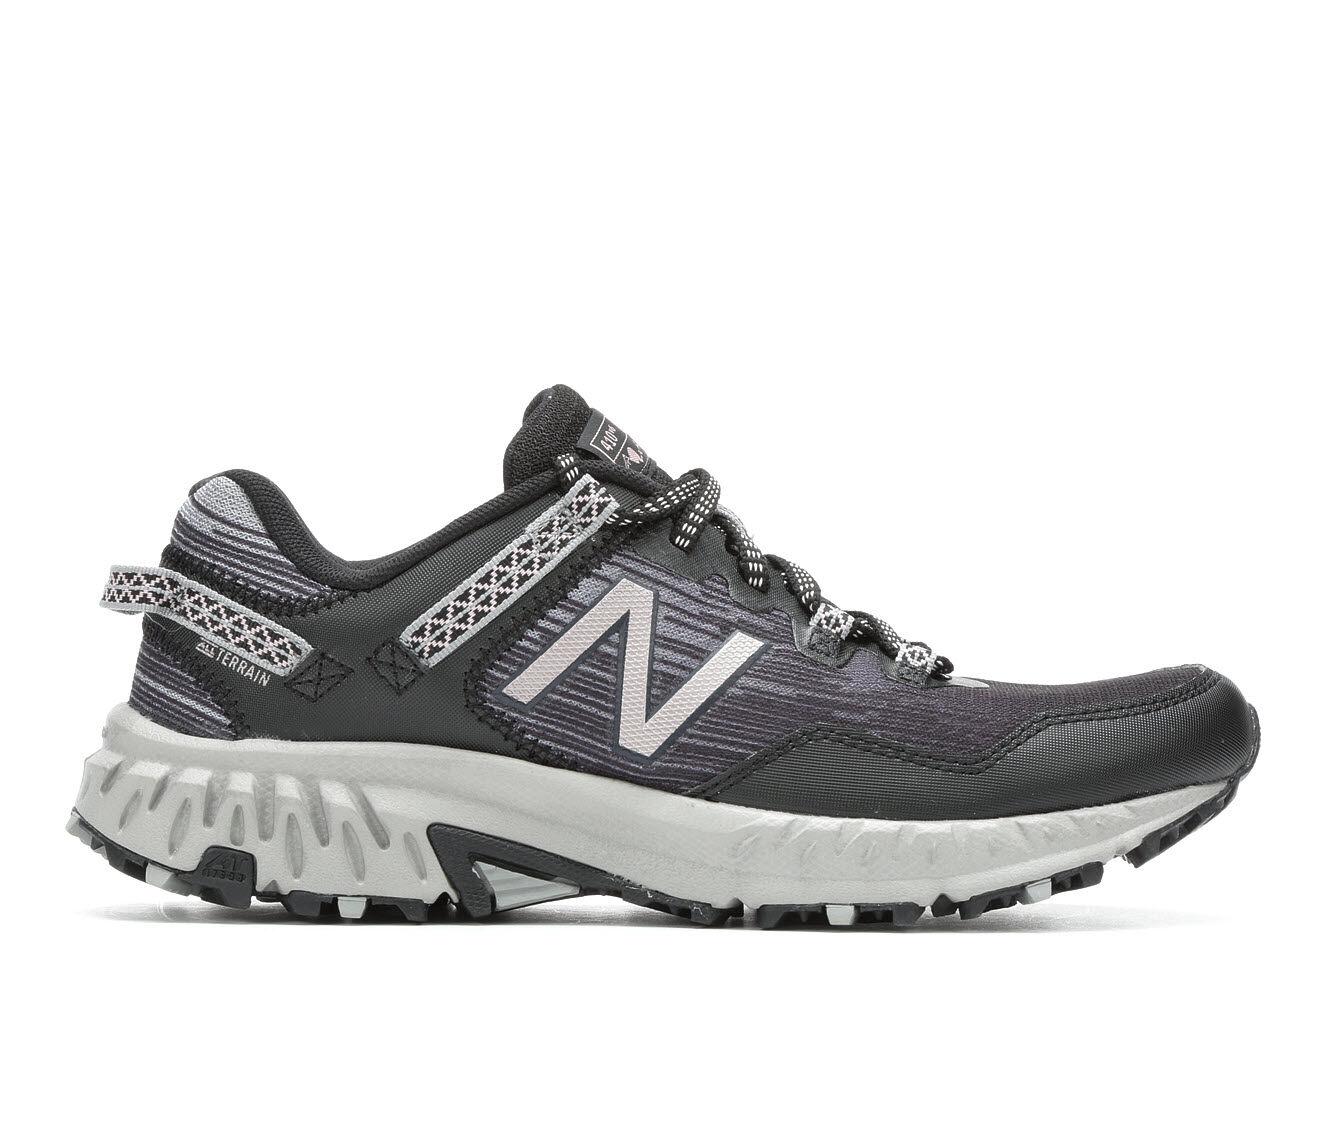 Women's New Balance WT410V6 Trail Running Shoes Blk/Magnet/Rose